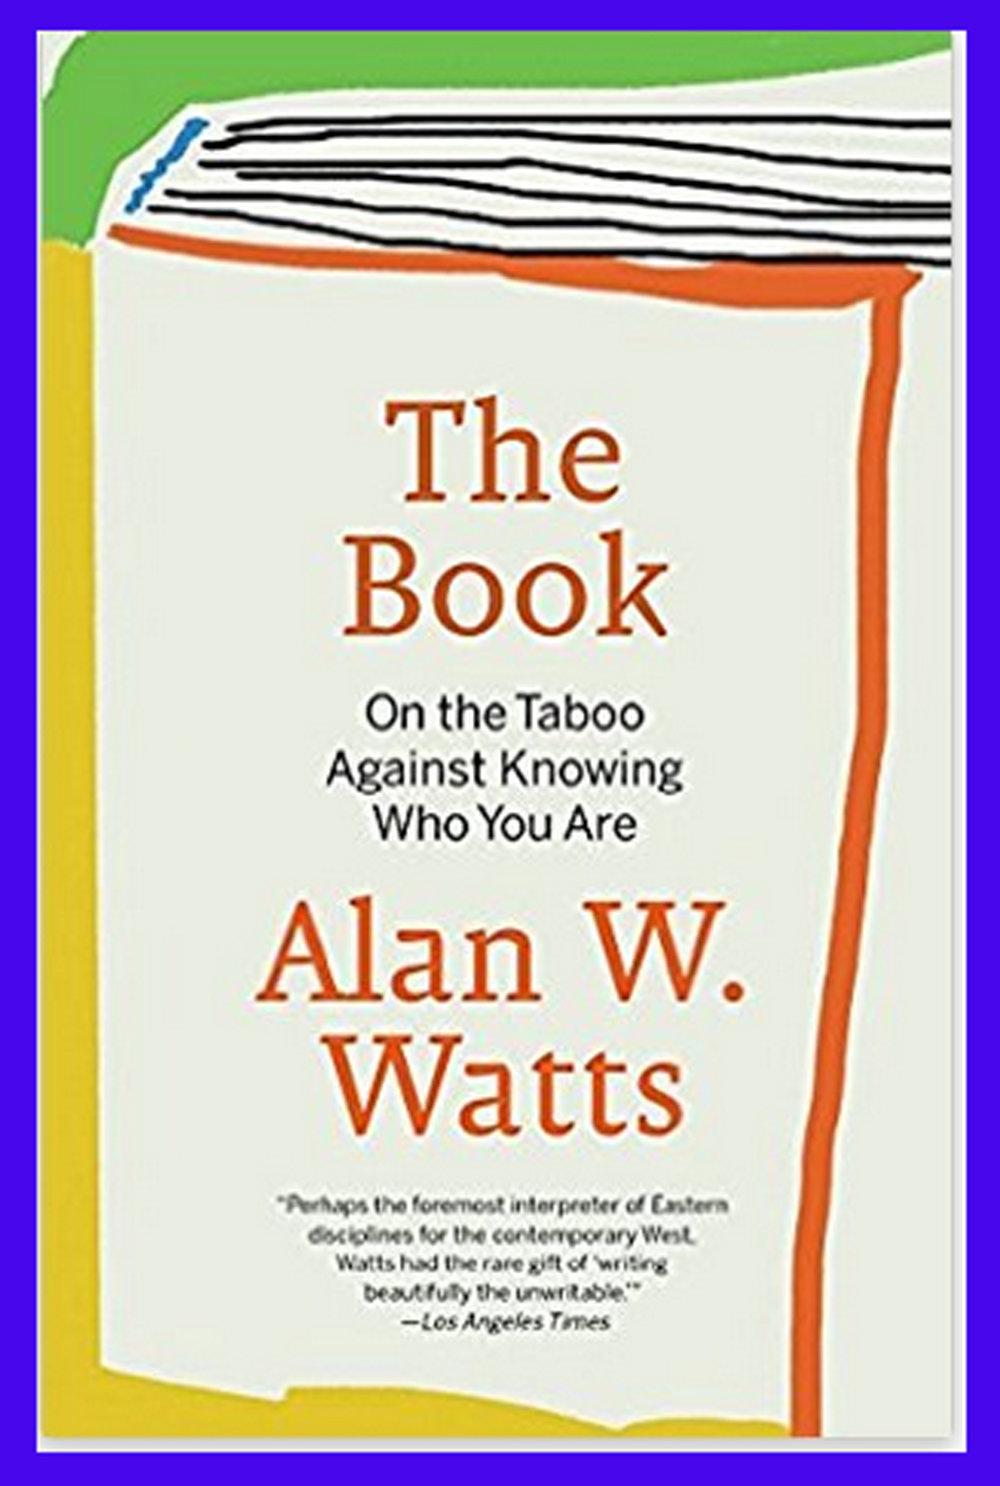 SS-The-Book.jpg